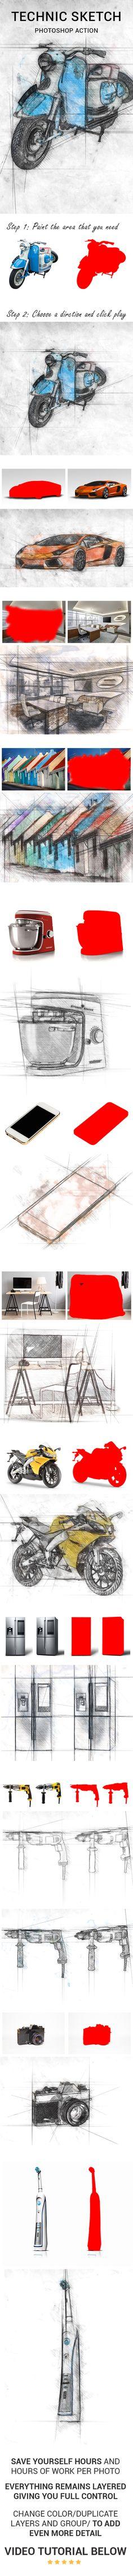 TechnicSketch — Photoshop ABR #art #architect • Available here → https://graphicriver.net/item/technicsketch/18142511?ref=pxcr